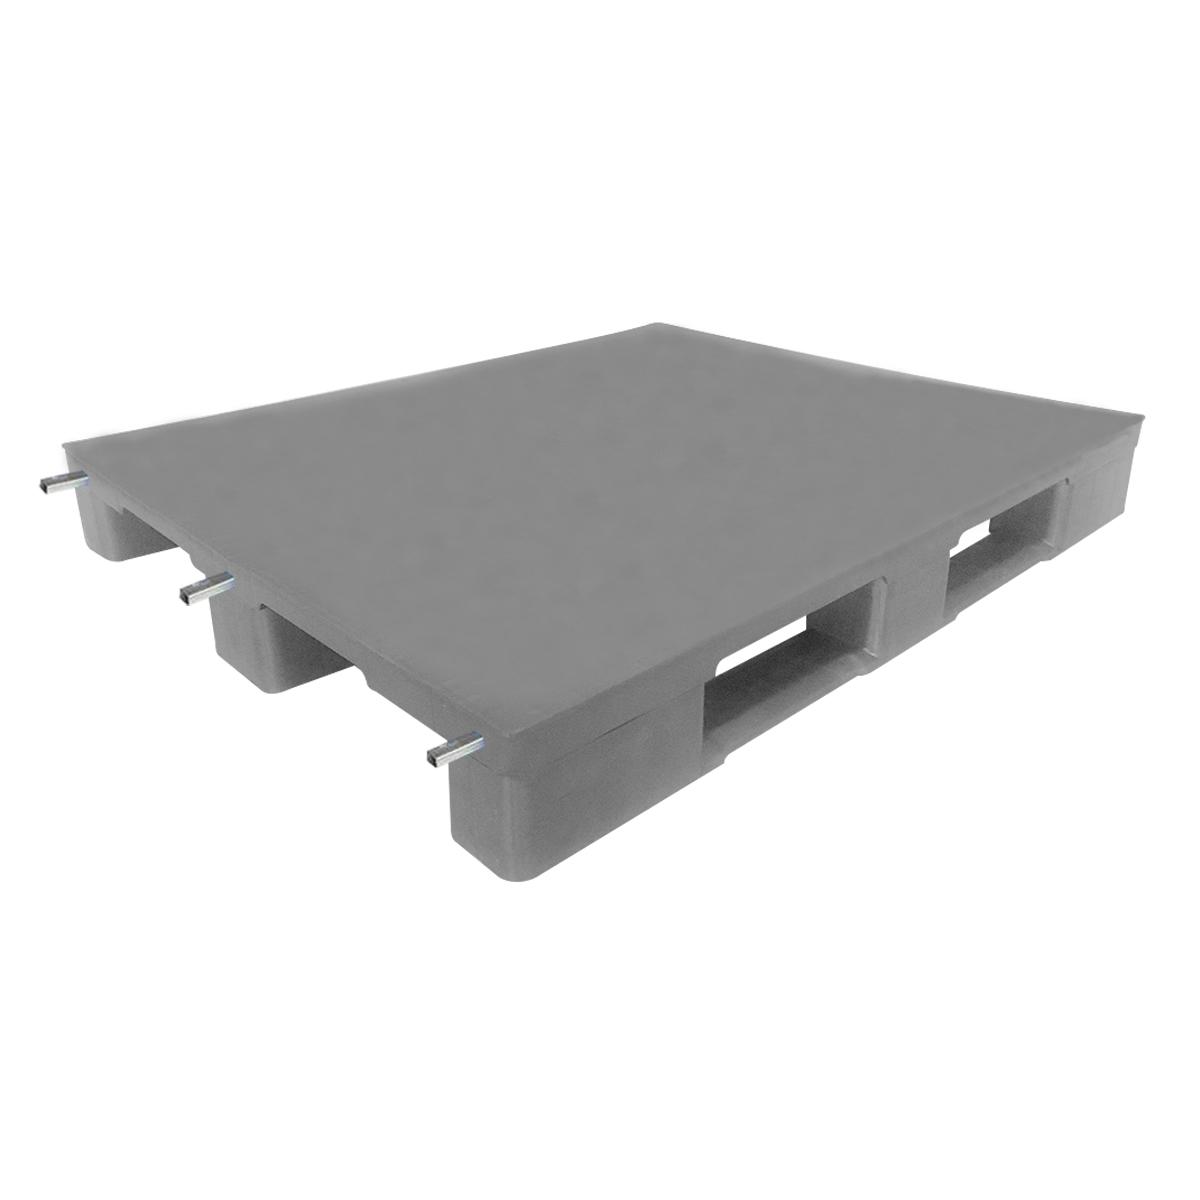 Profilli Yük Paleti 100x120cm gri kapalı 3xprofilli